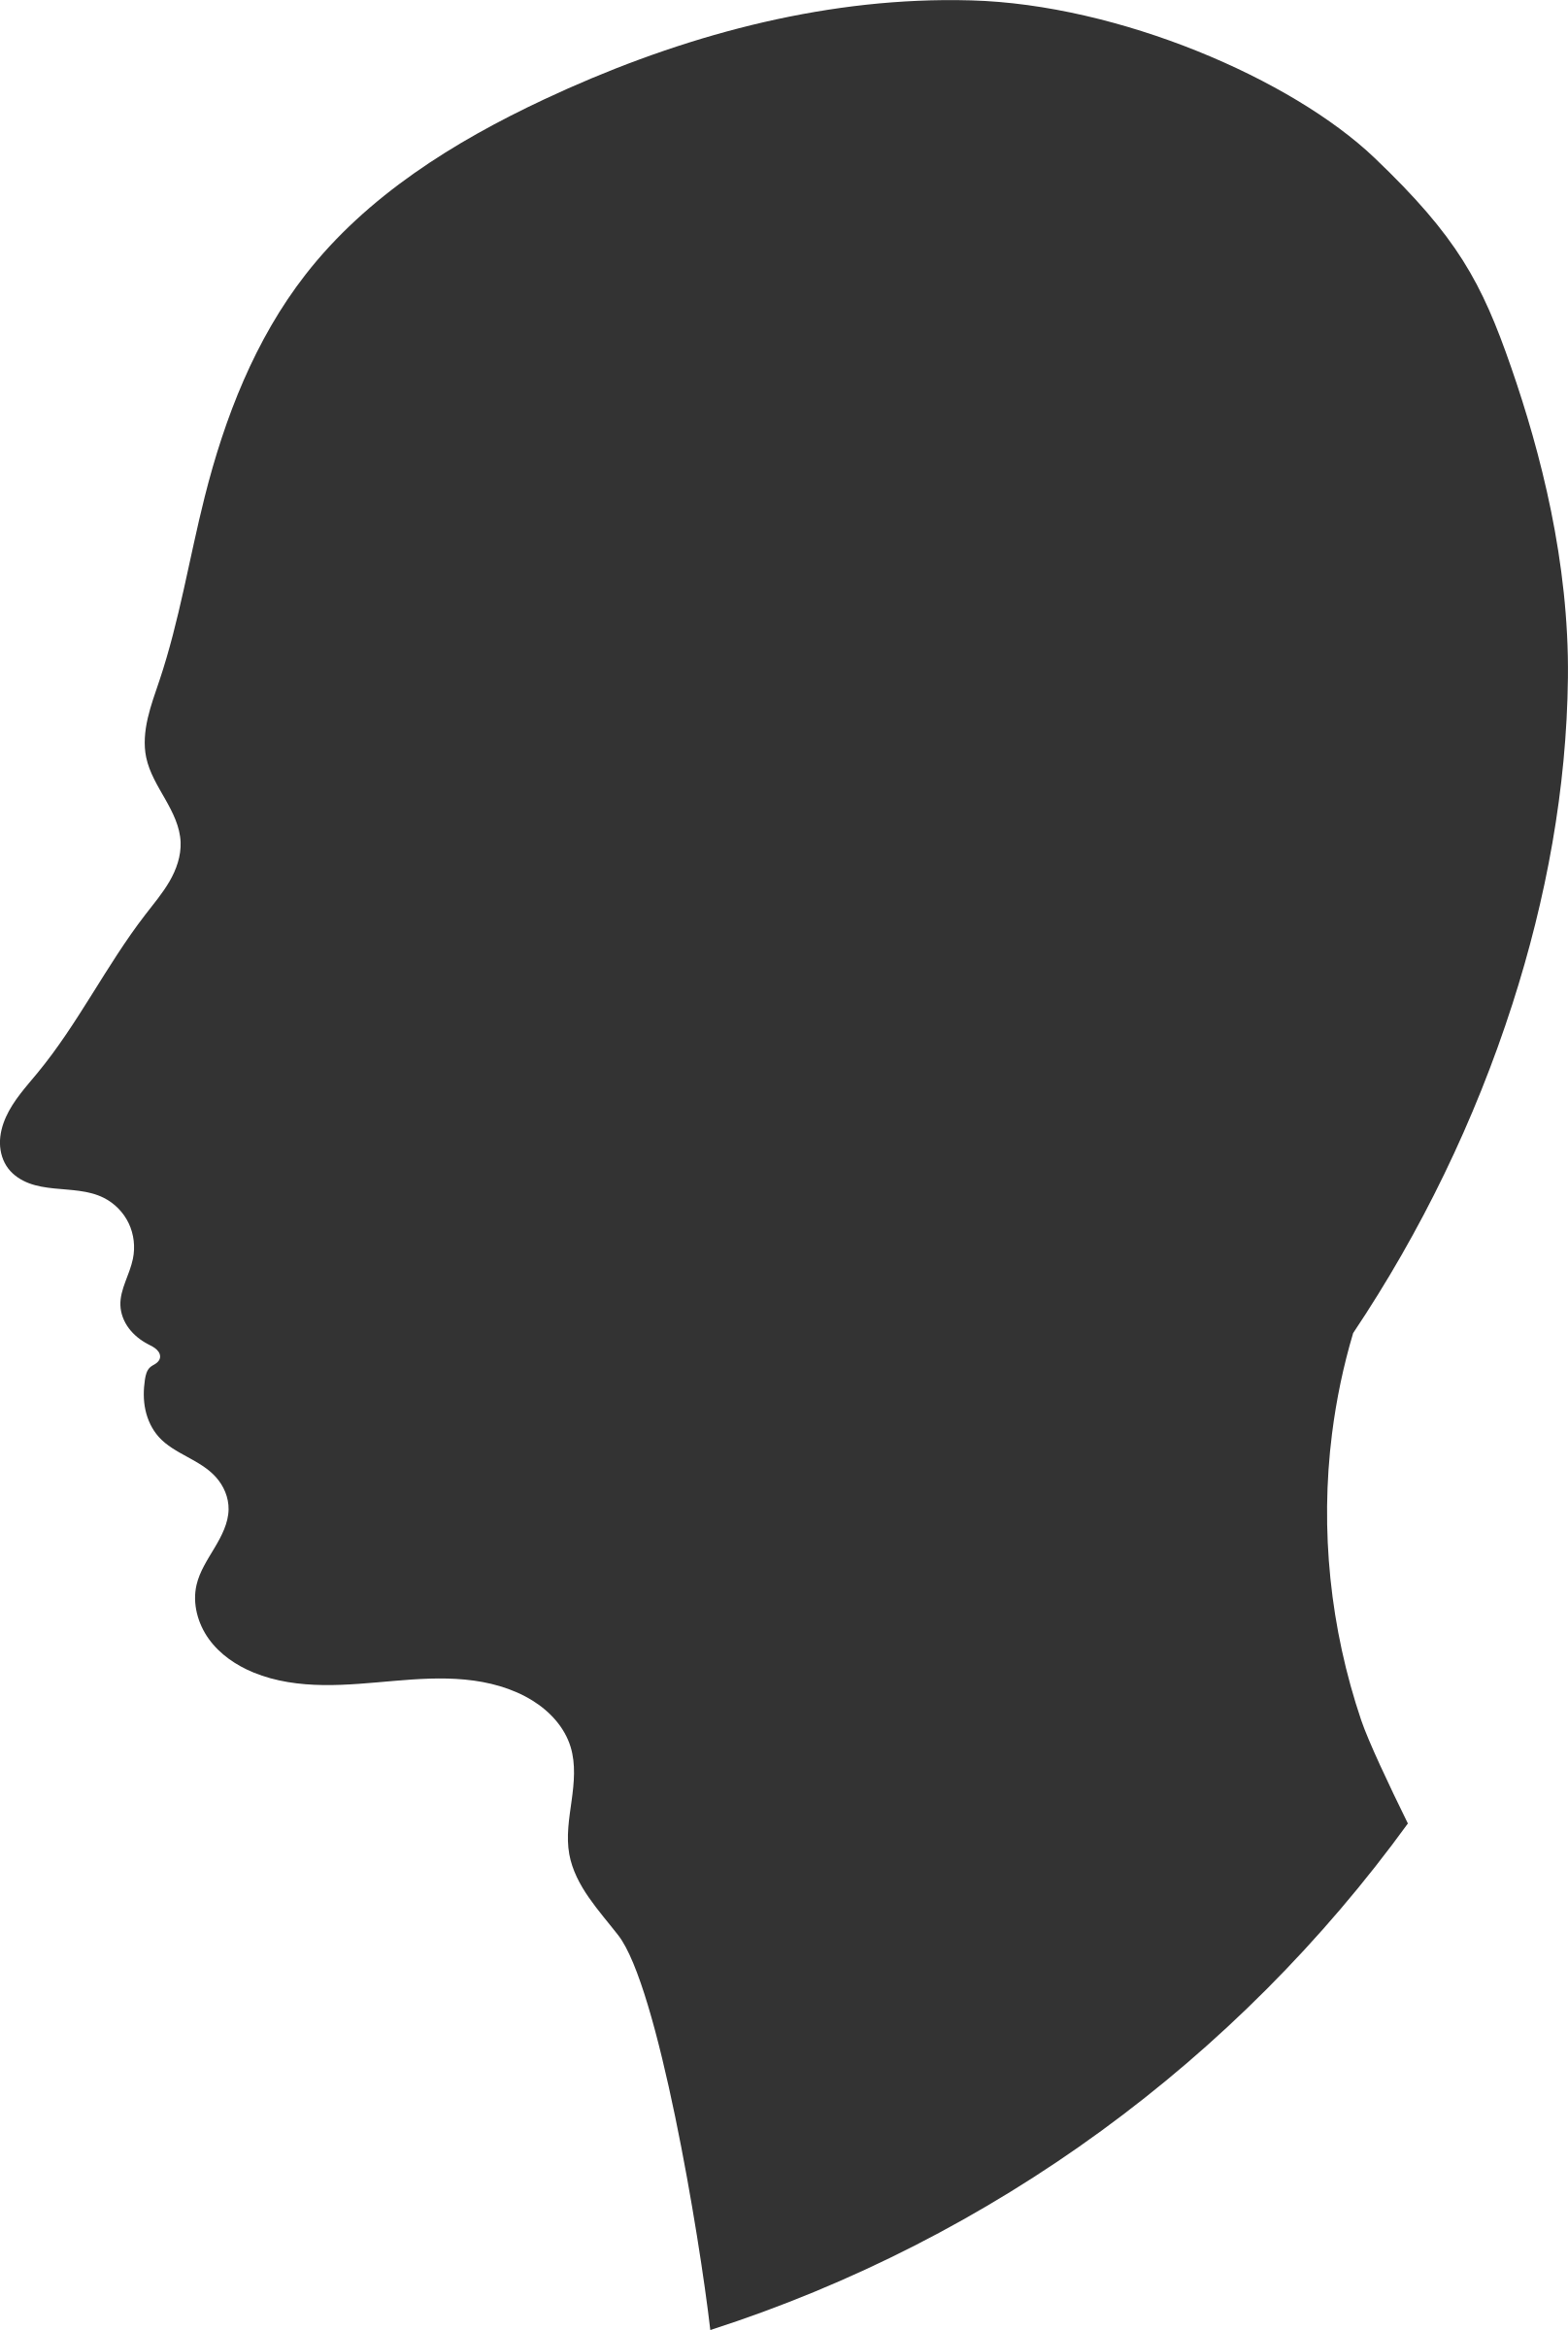 Profile big image png. Computers clipart head